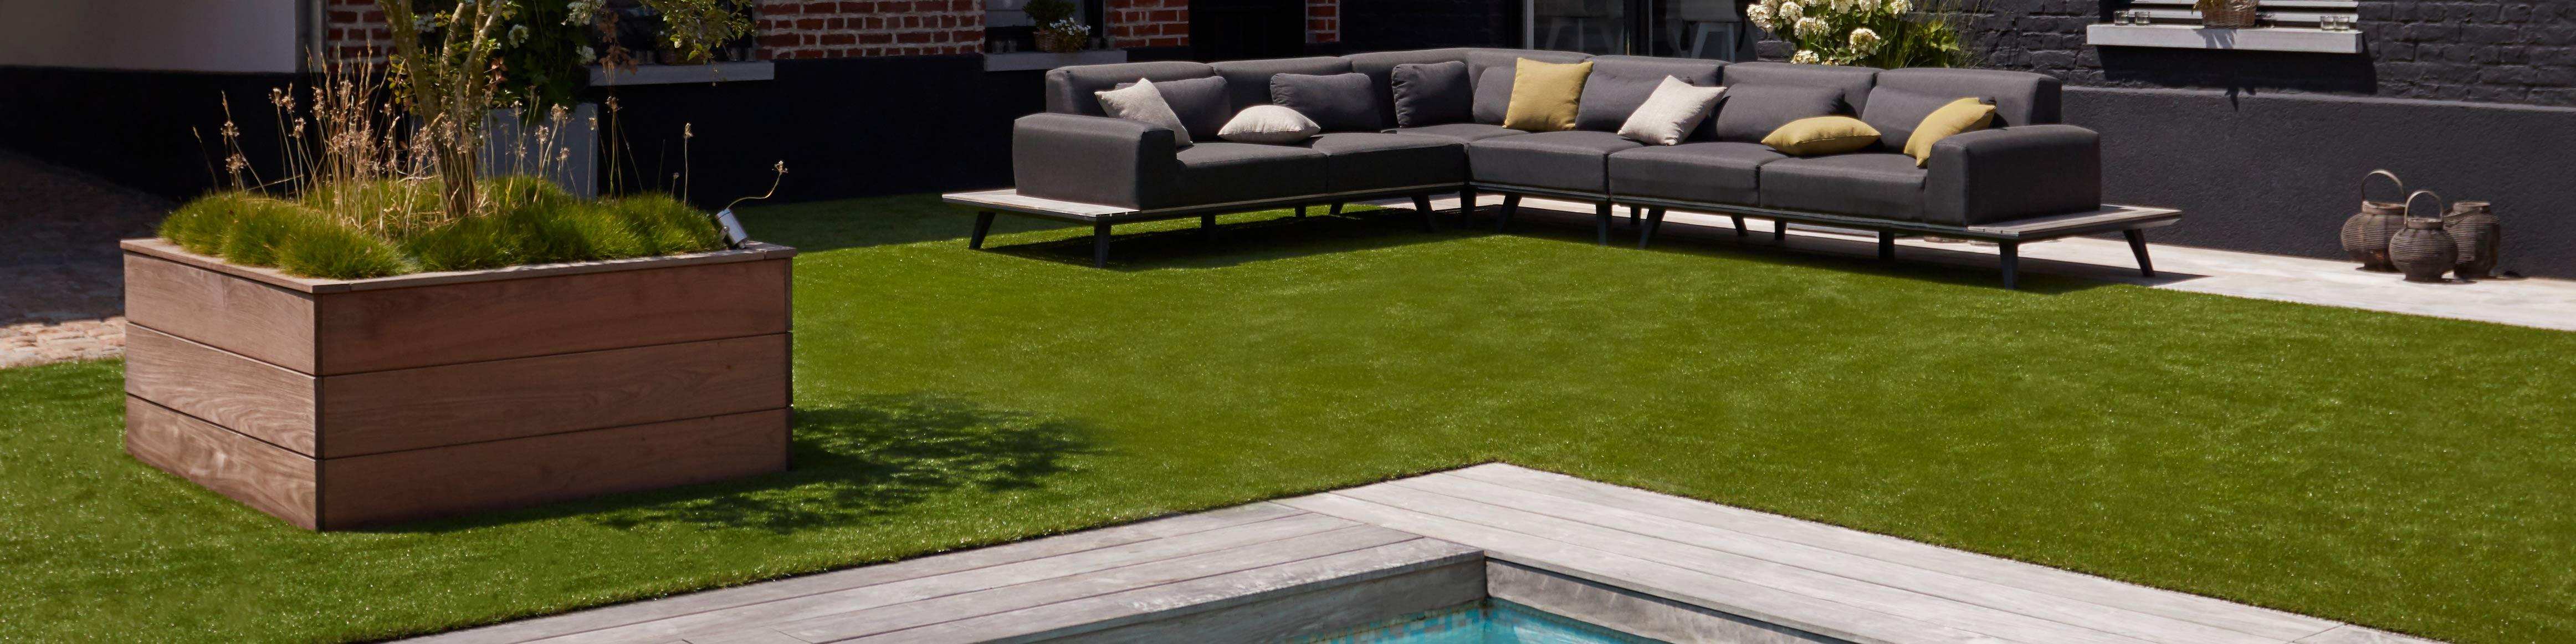 gazon synthetique pelouse synthetique gazon artificiel faux gazon prix saint maclou